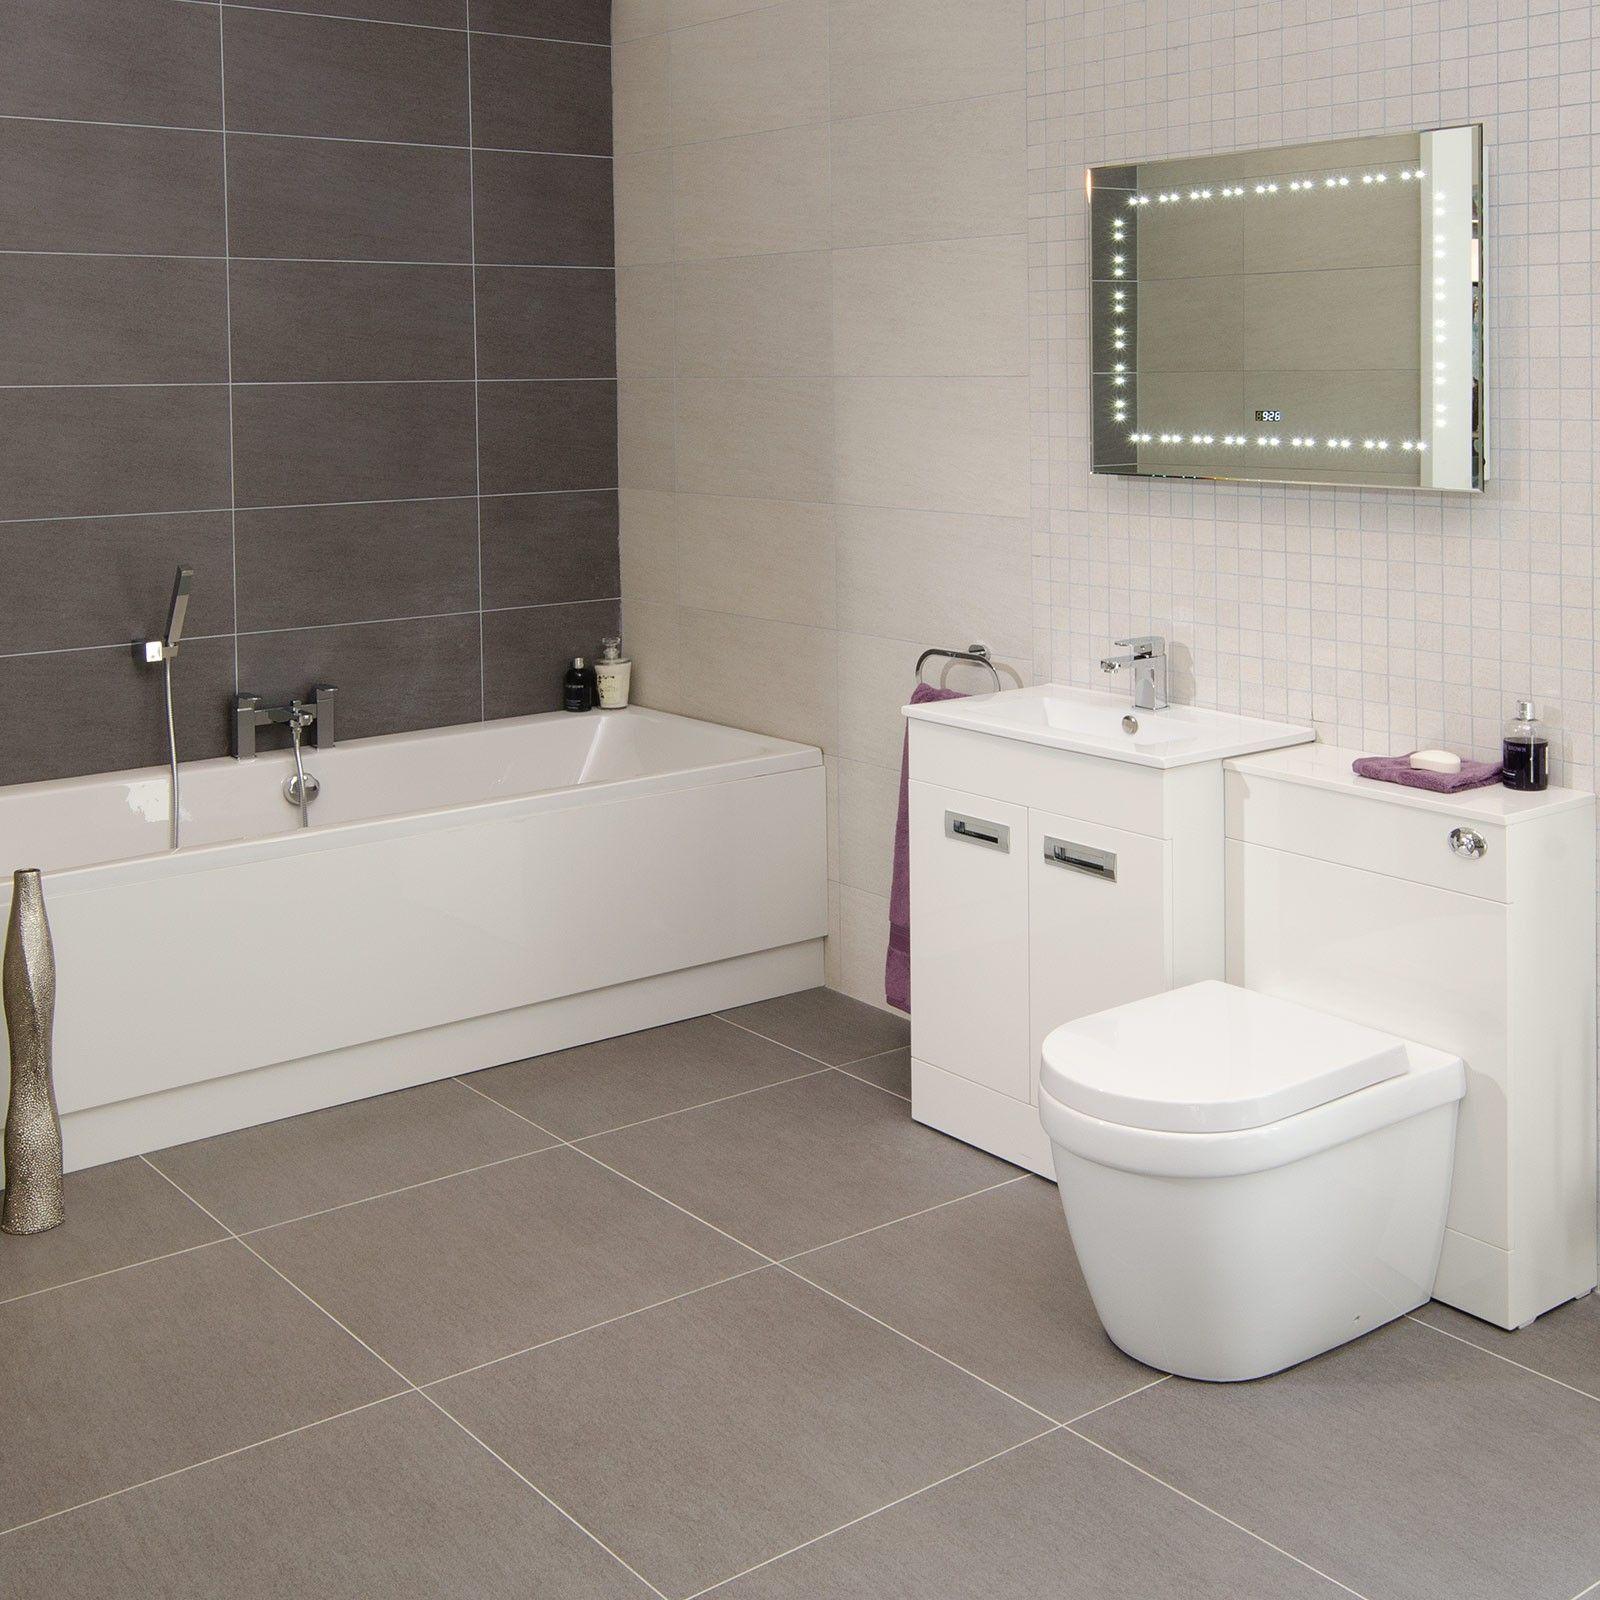 Quattro Silver Wall Tile Amazing Bathrooms Silver Walls Wall Tiles